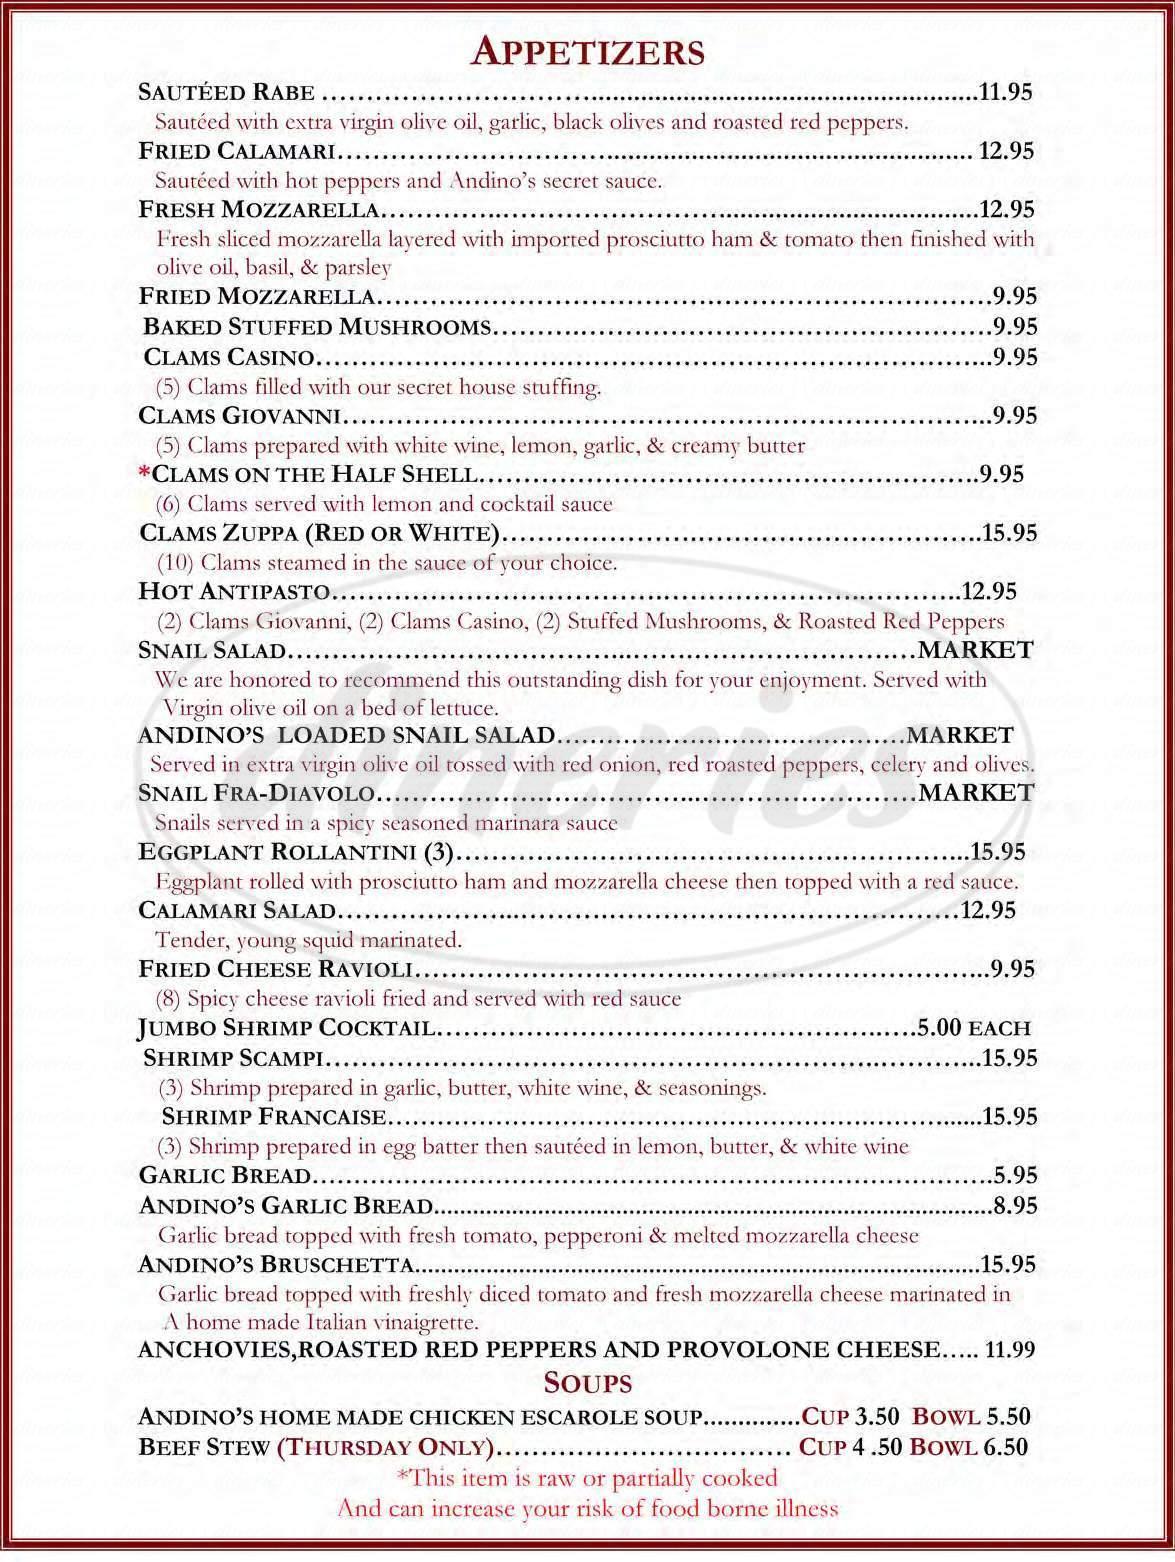 menu for Andino's